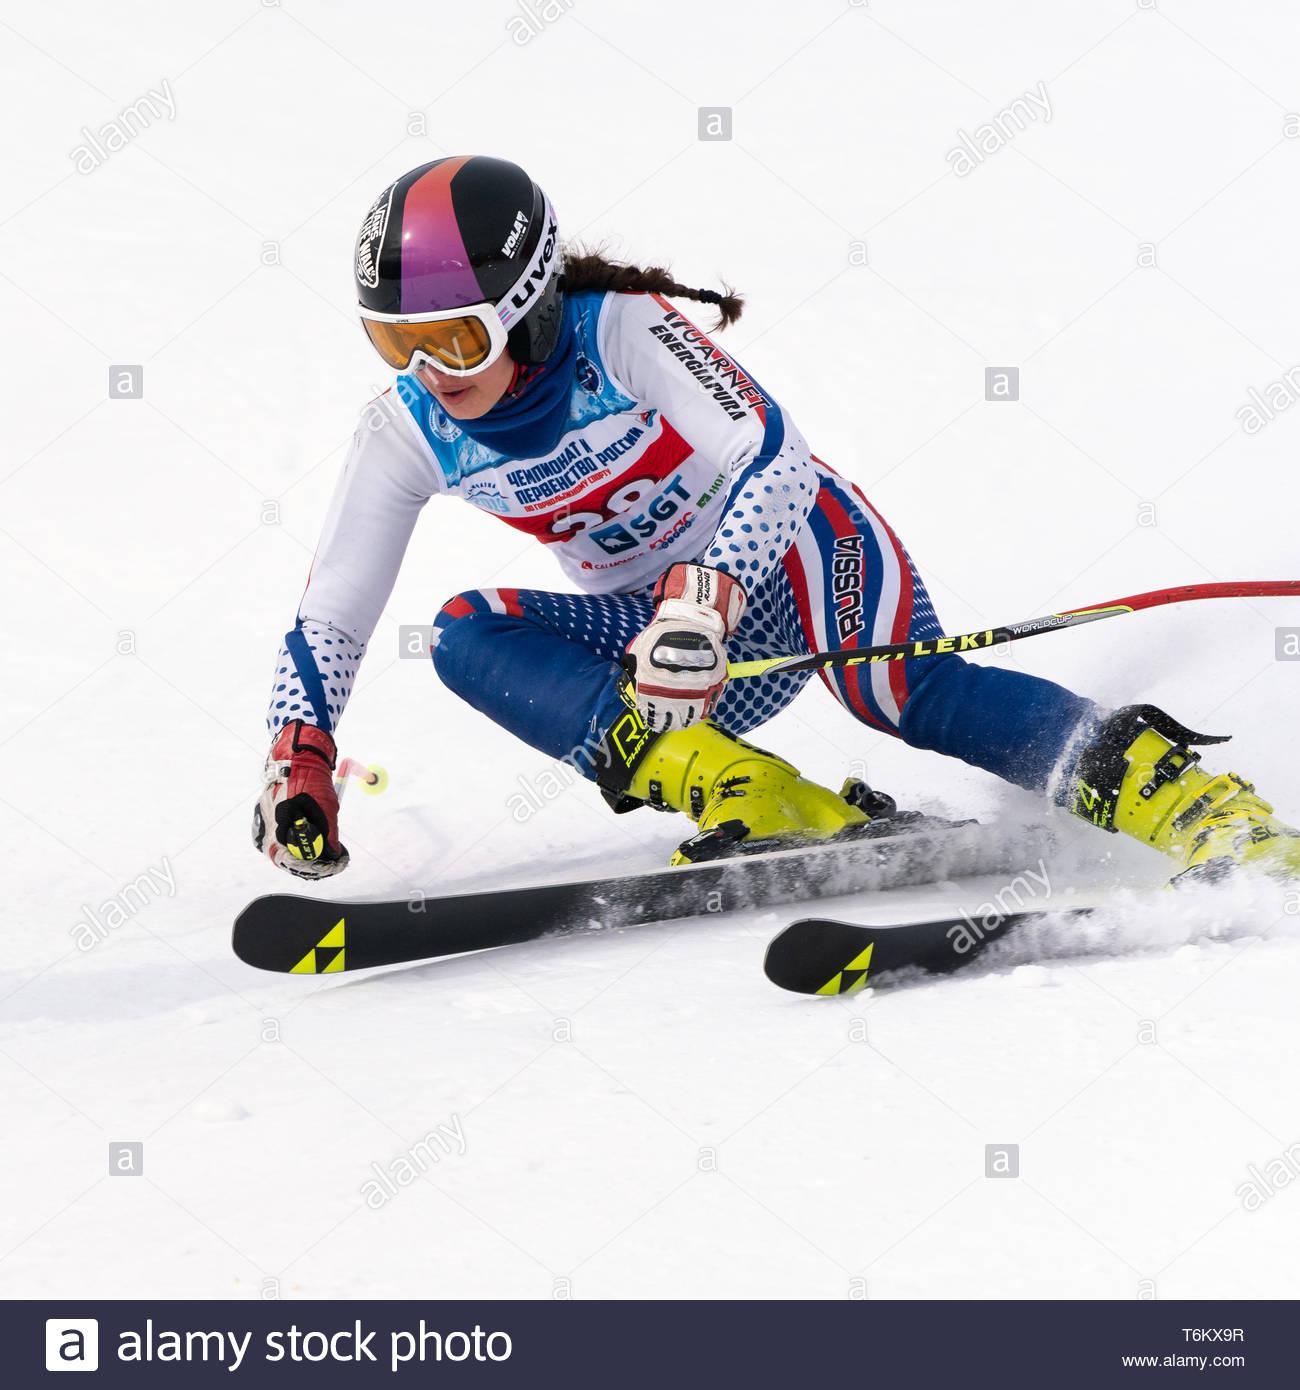 KAMCHATKA PENINSULA, RUSSIA - APRIL 2, 2019: Mountain skier Vakhnina Anna (Krasnoyarsk) skiing down mount. International Ski Federation Championship,  - Stock Image